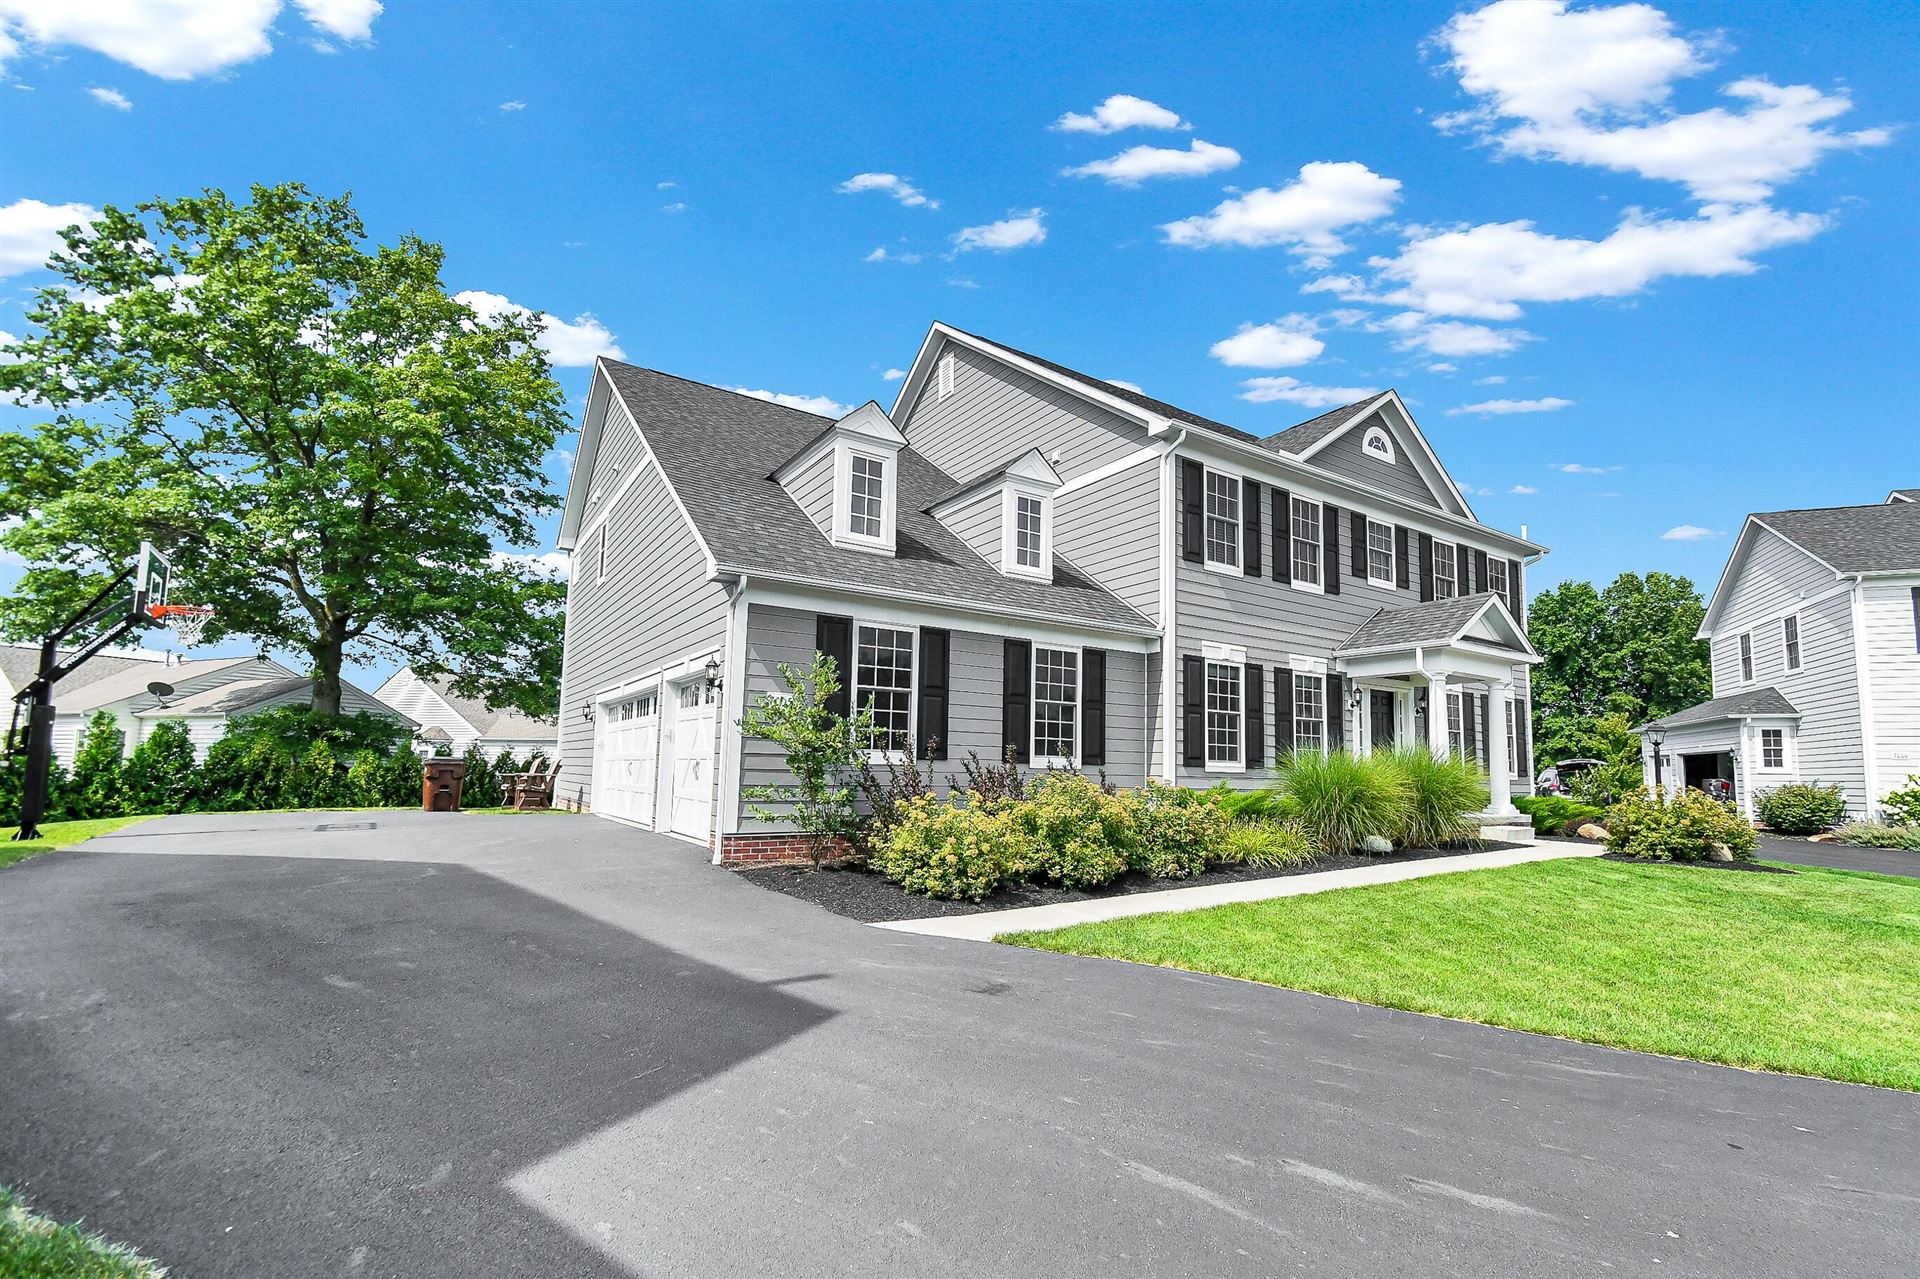 Photo of 7005 Millbrook Farm Drive, New Albany, OH 43054 (MLS # 221028149)